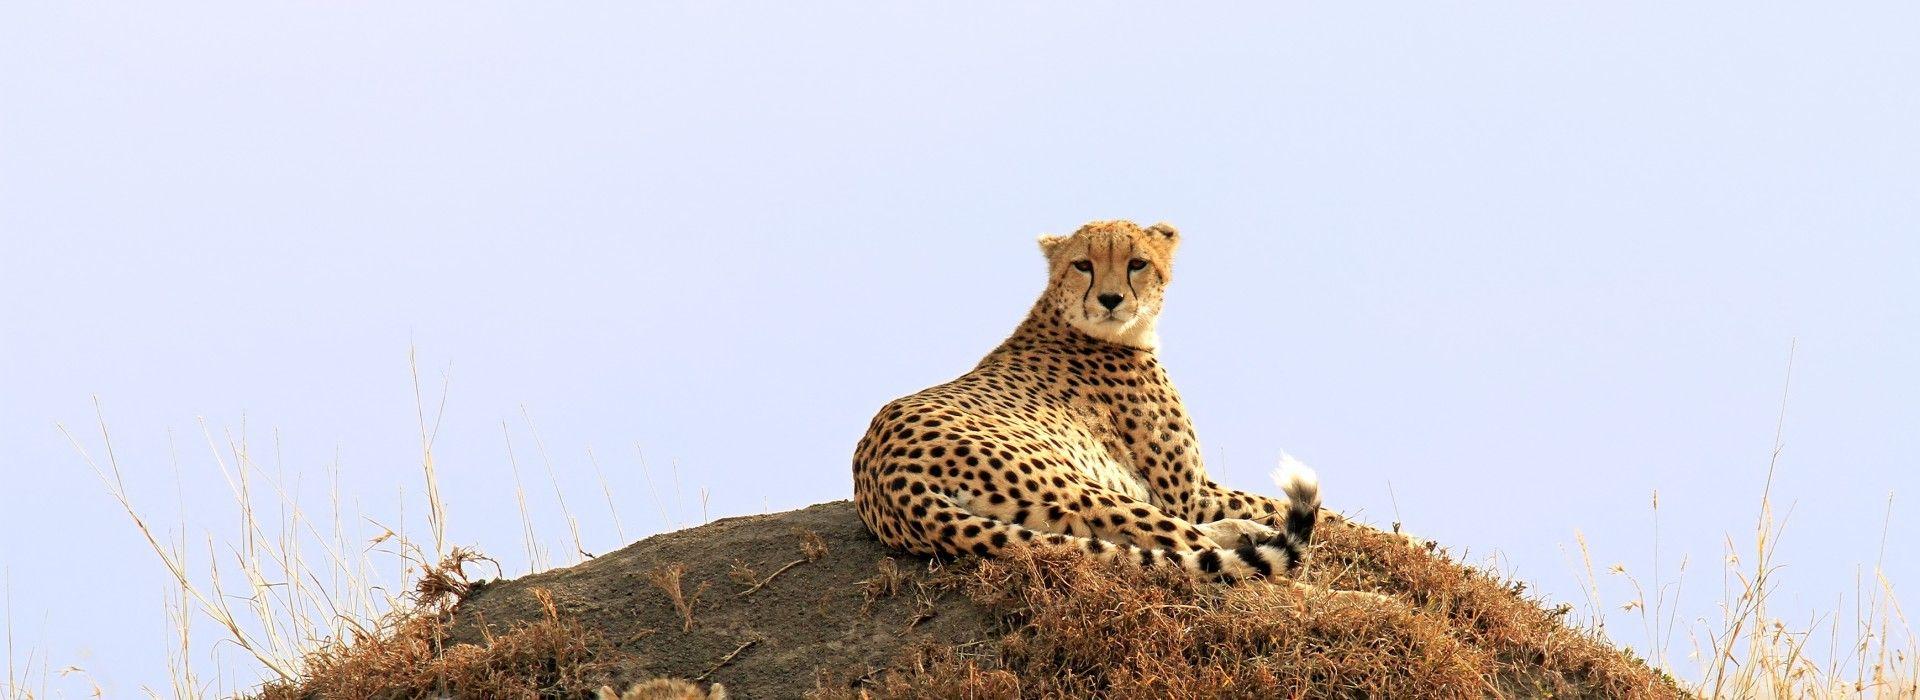 Getaways and short breaks Tours in Africa